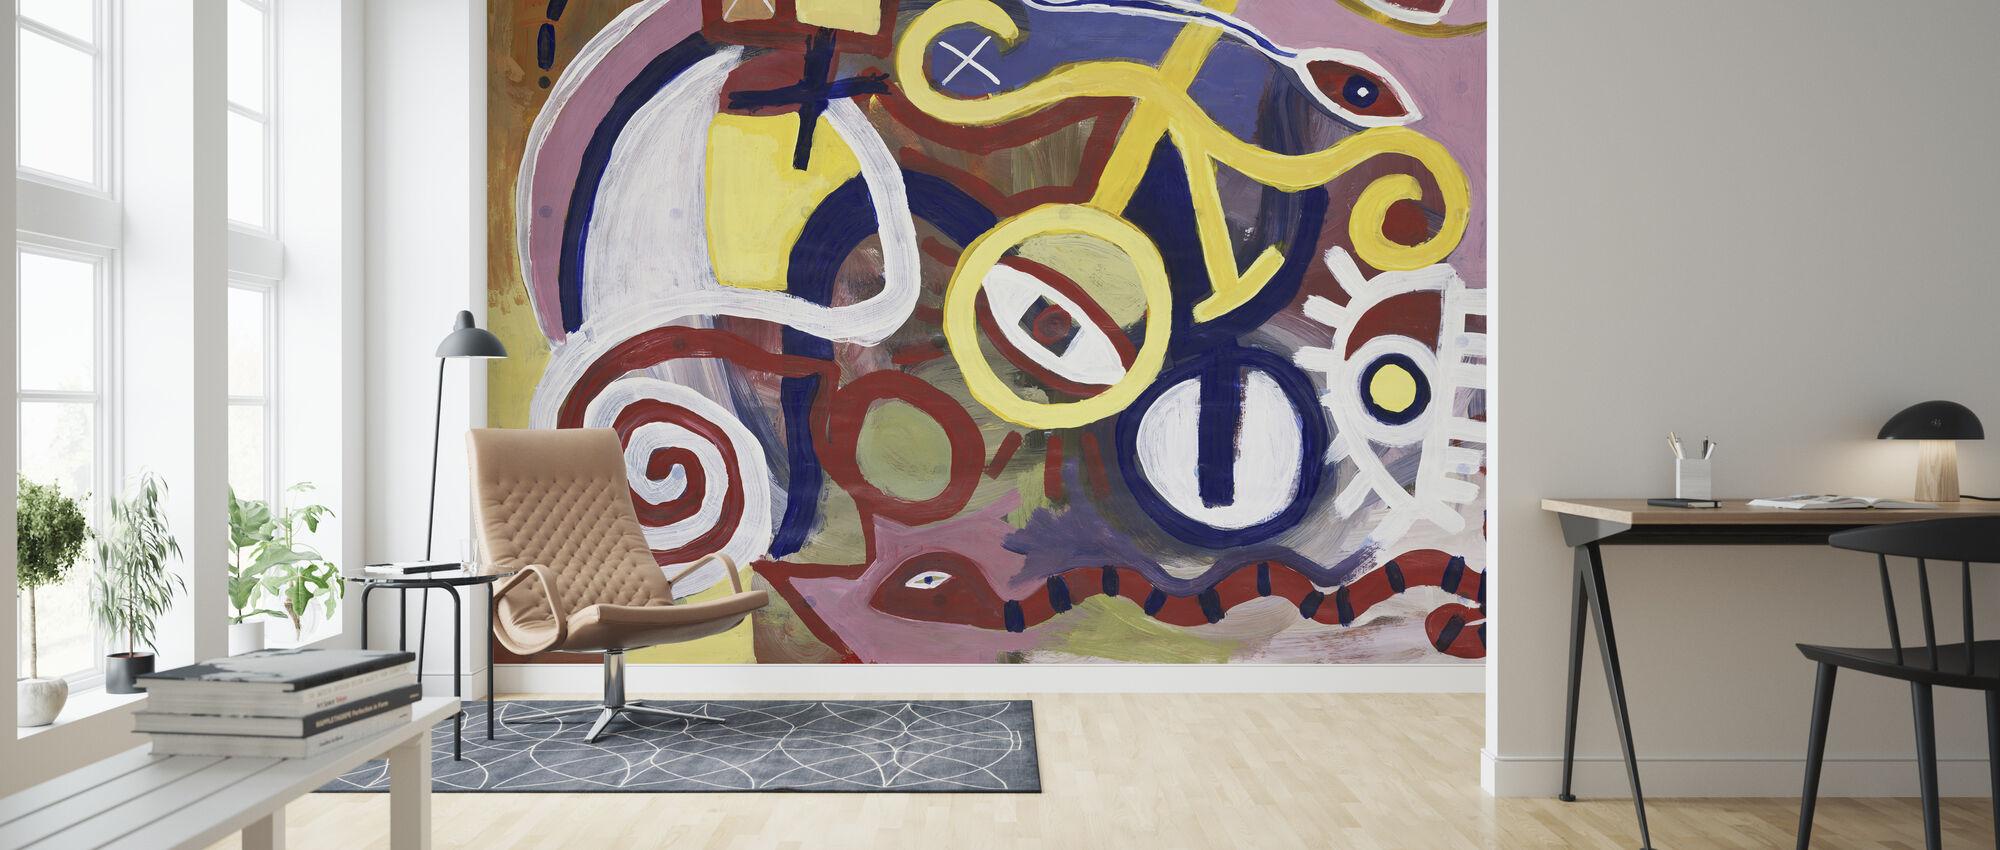 Seer - Arnold Rice - Wallpaper - Living Room